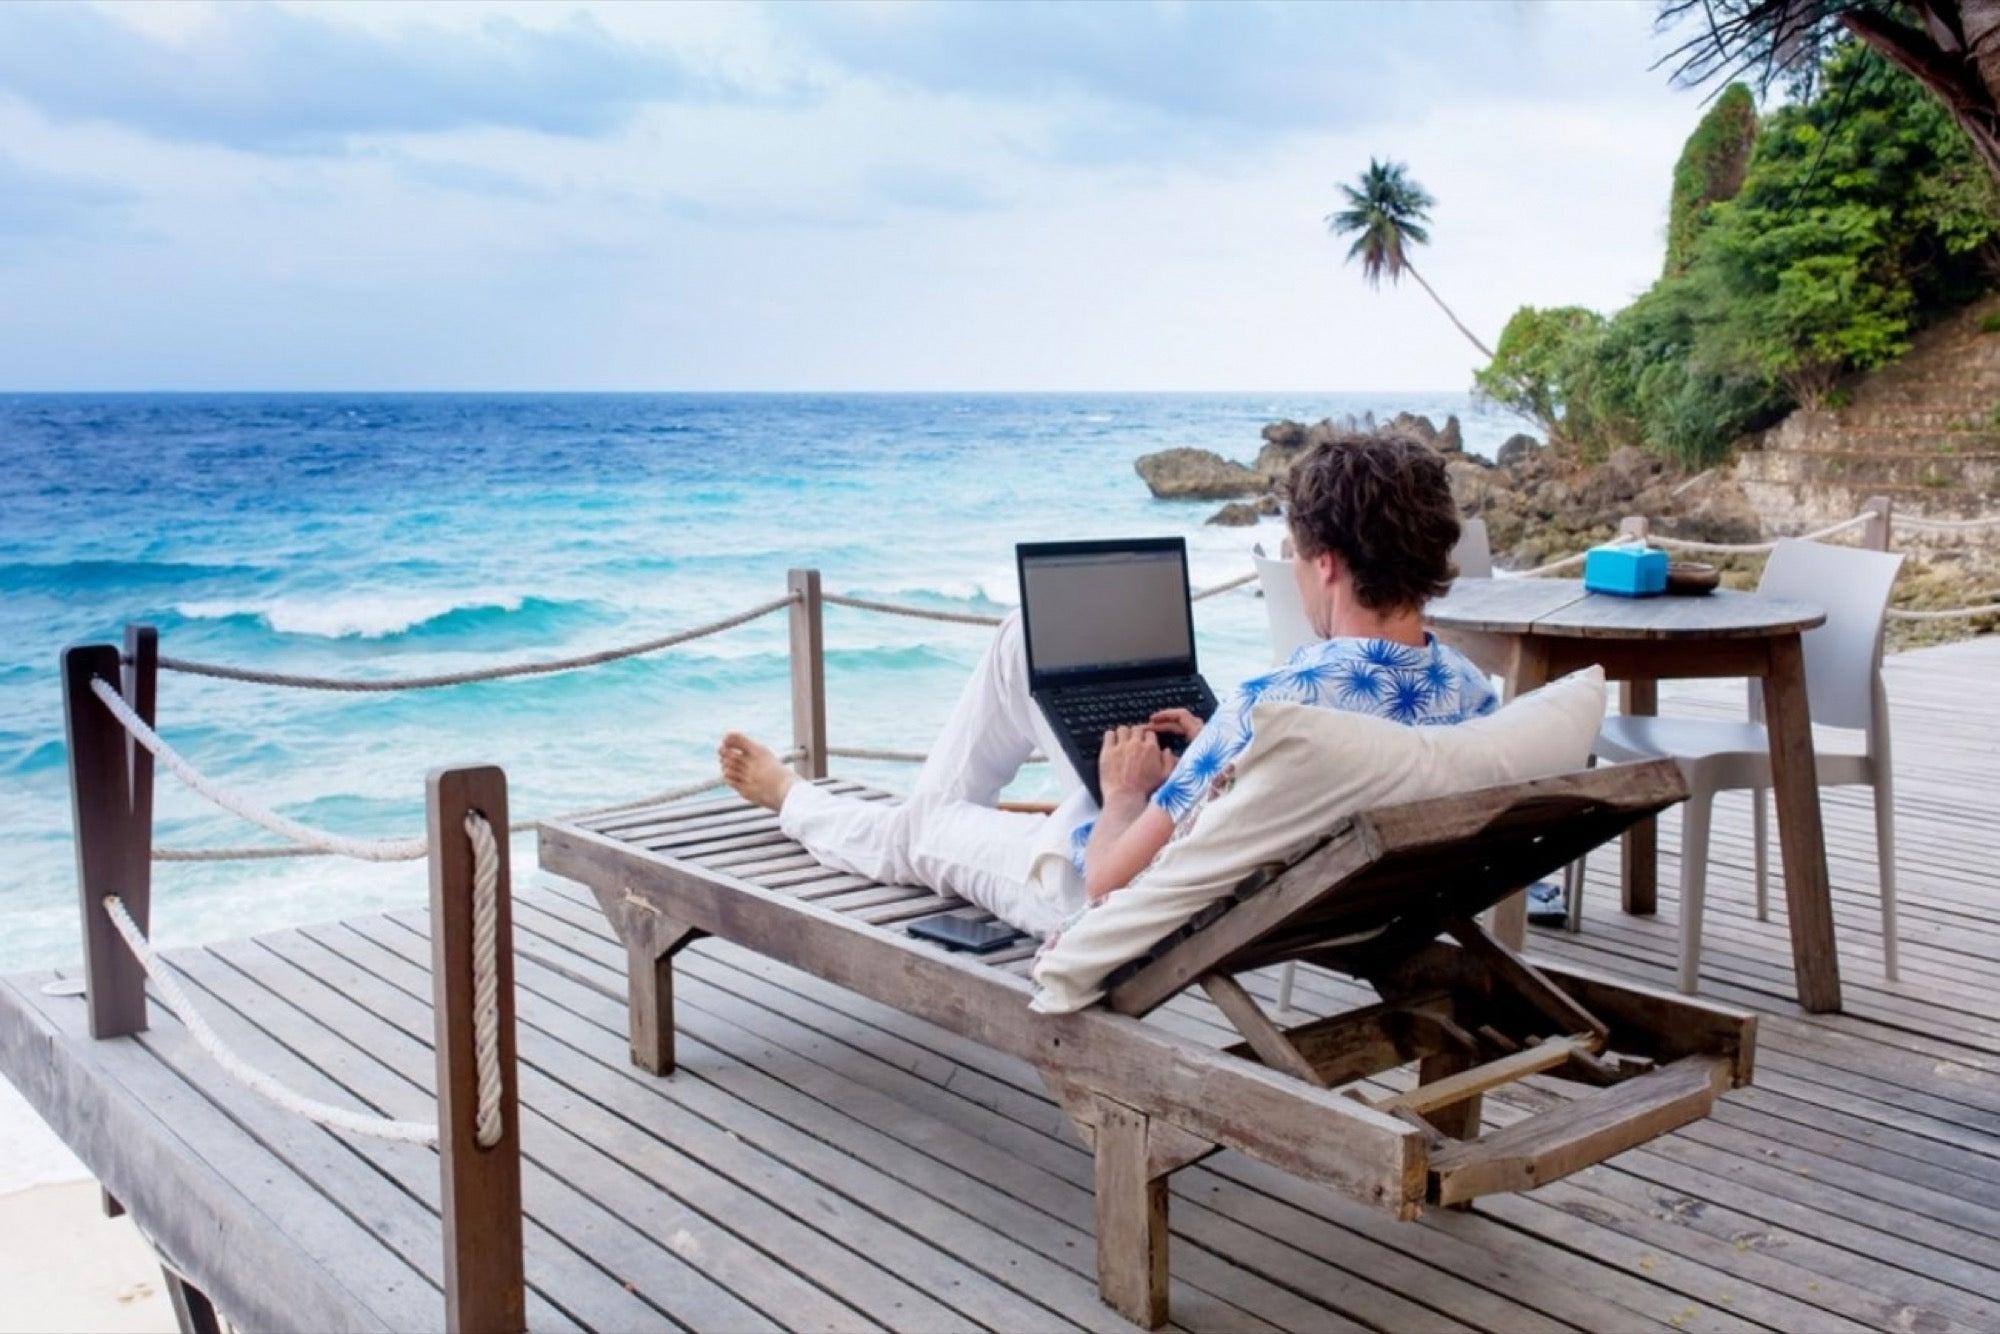 Freelance вакансии удаленная работа фриланс постинг на авито